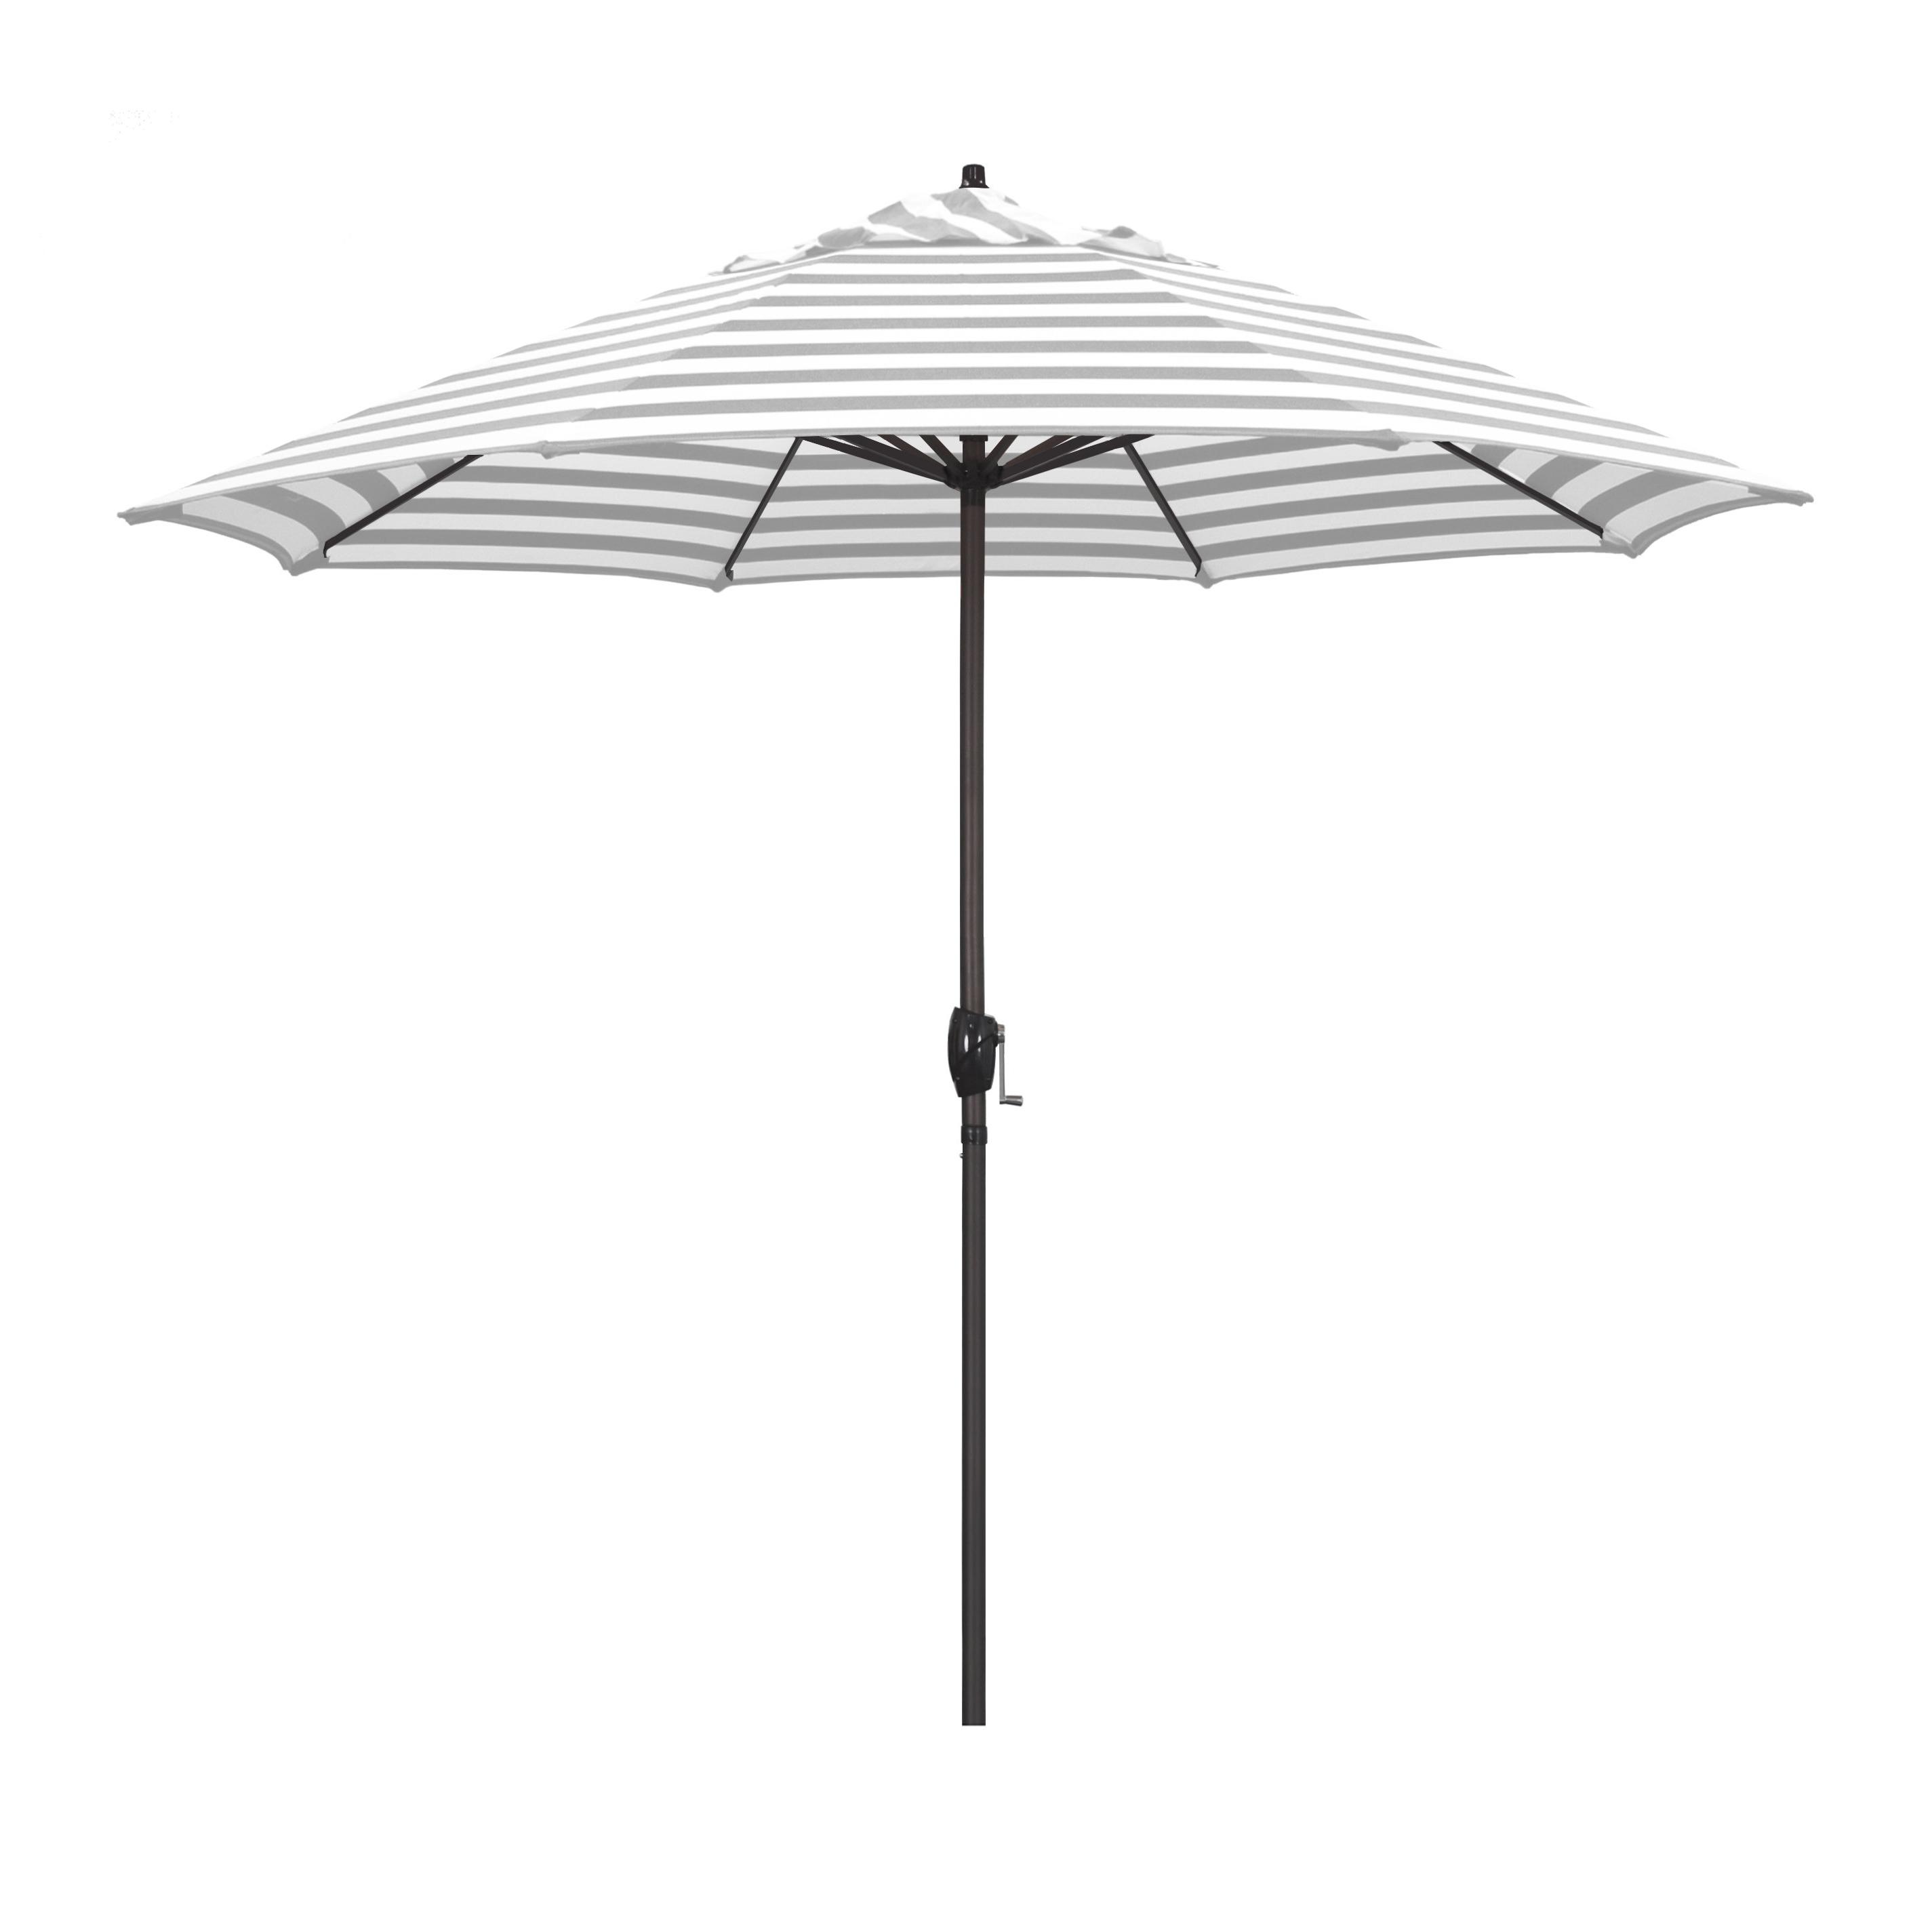 Most Recent Cardine 9' Market Umbrella For Mcdougal Market Umbrellas (Gallery 6 of 20)